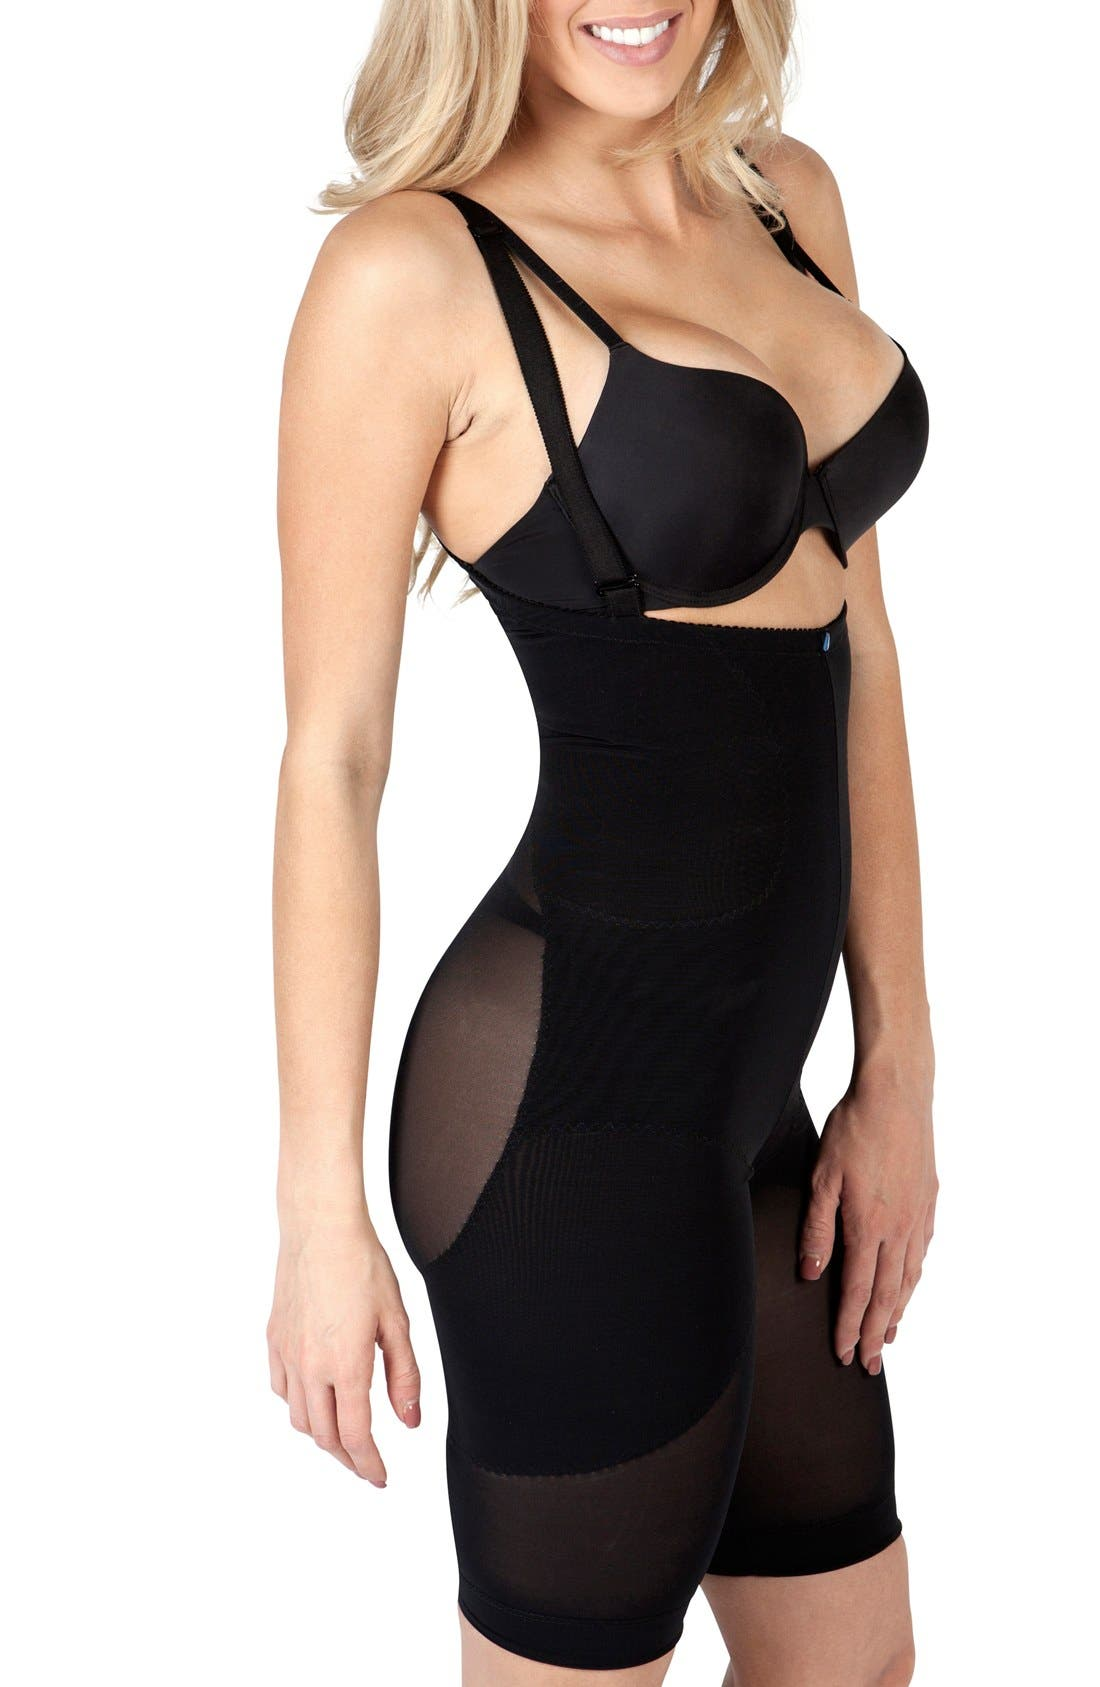 'Leilani' Body Shaping Garment,                             Alternate thumbnail 3, color,                             BLACK